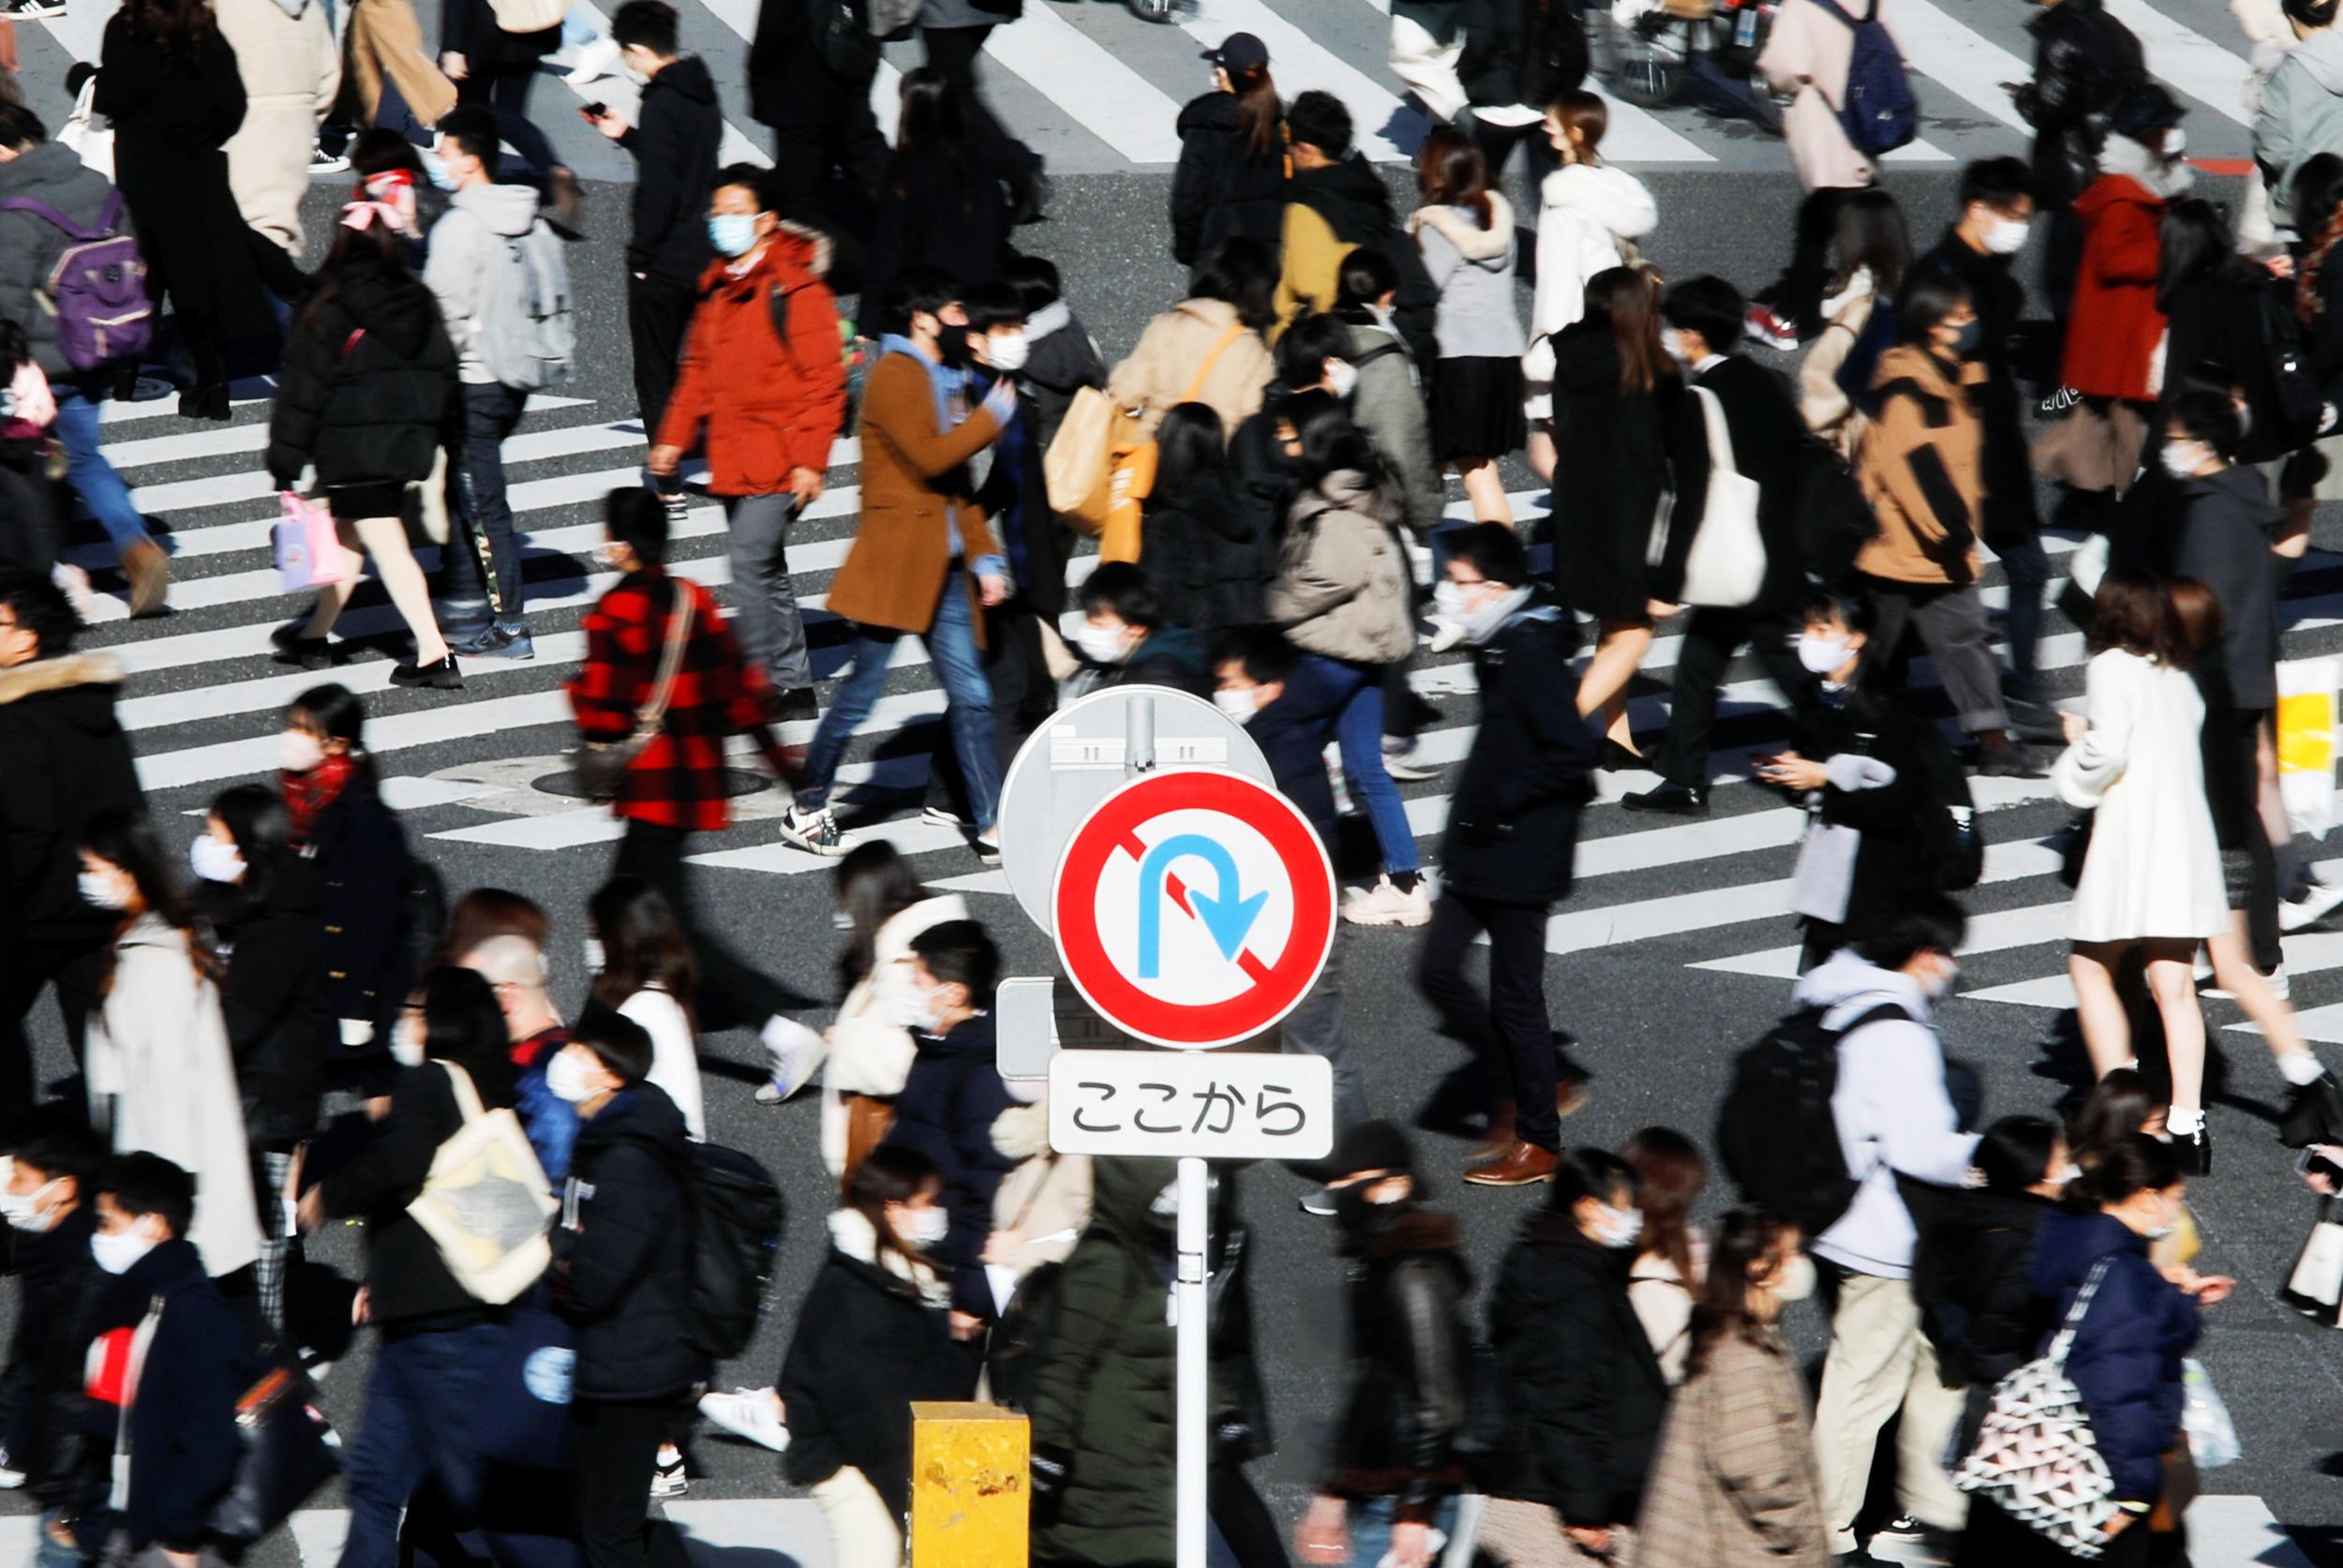 New coronavirus variant found in travelers from Brazil, Japan says